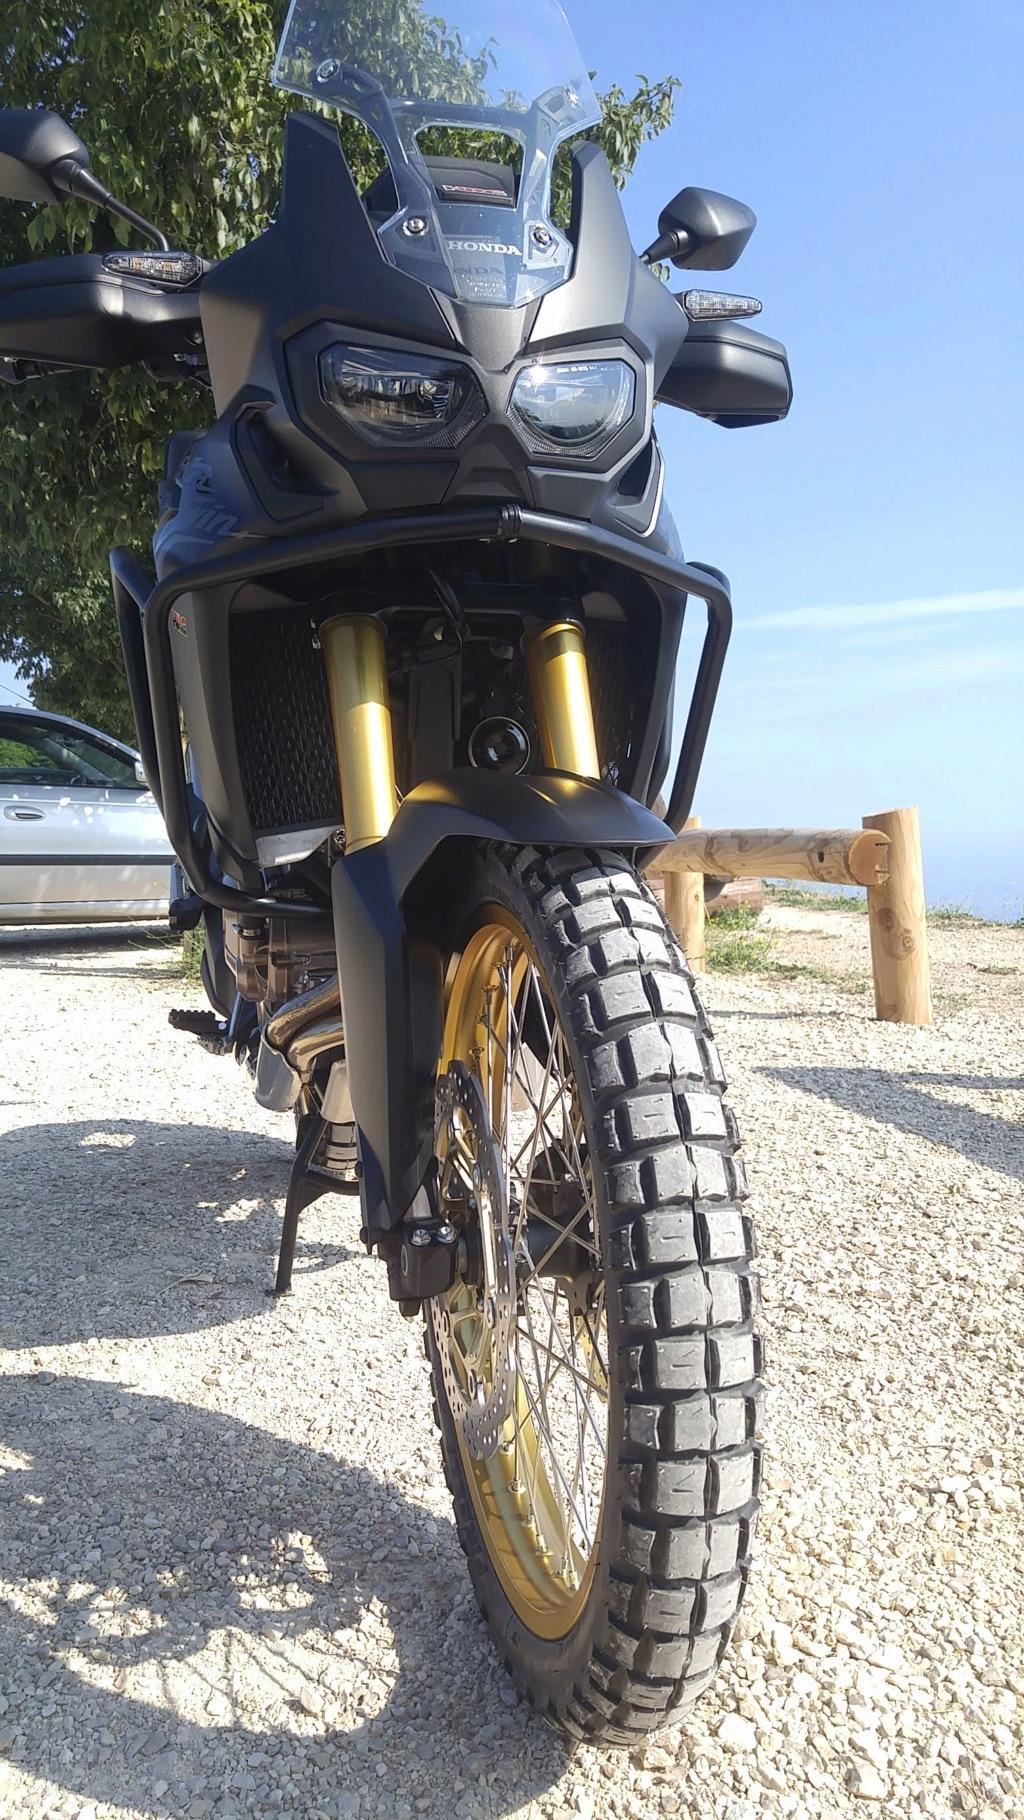 Pirelli Scorpion Rally STR Dsc_0018